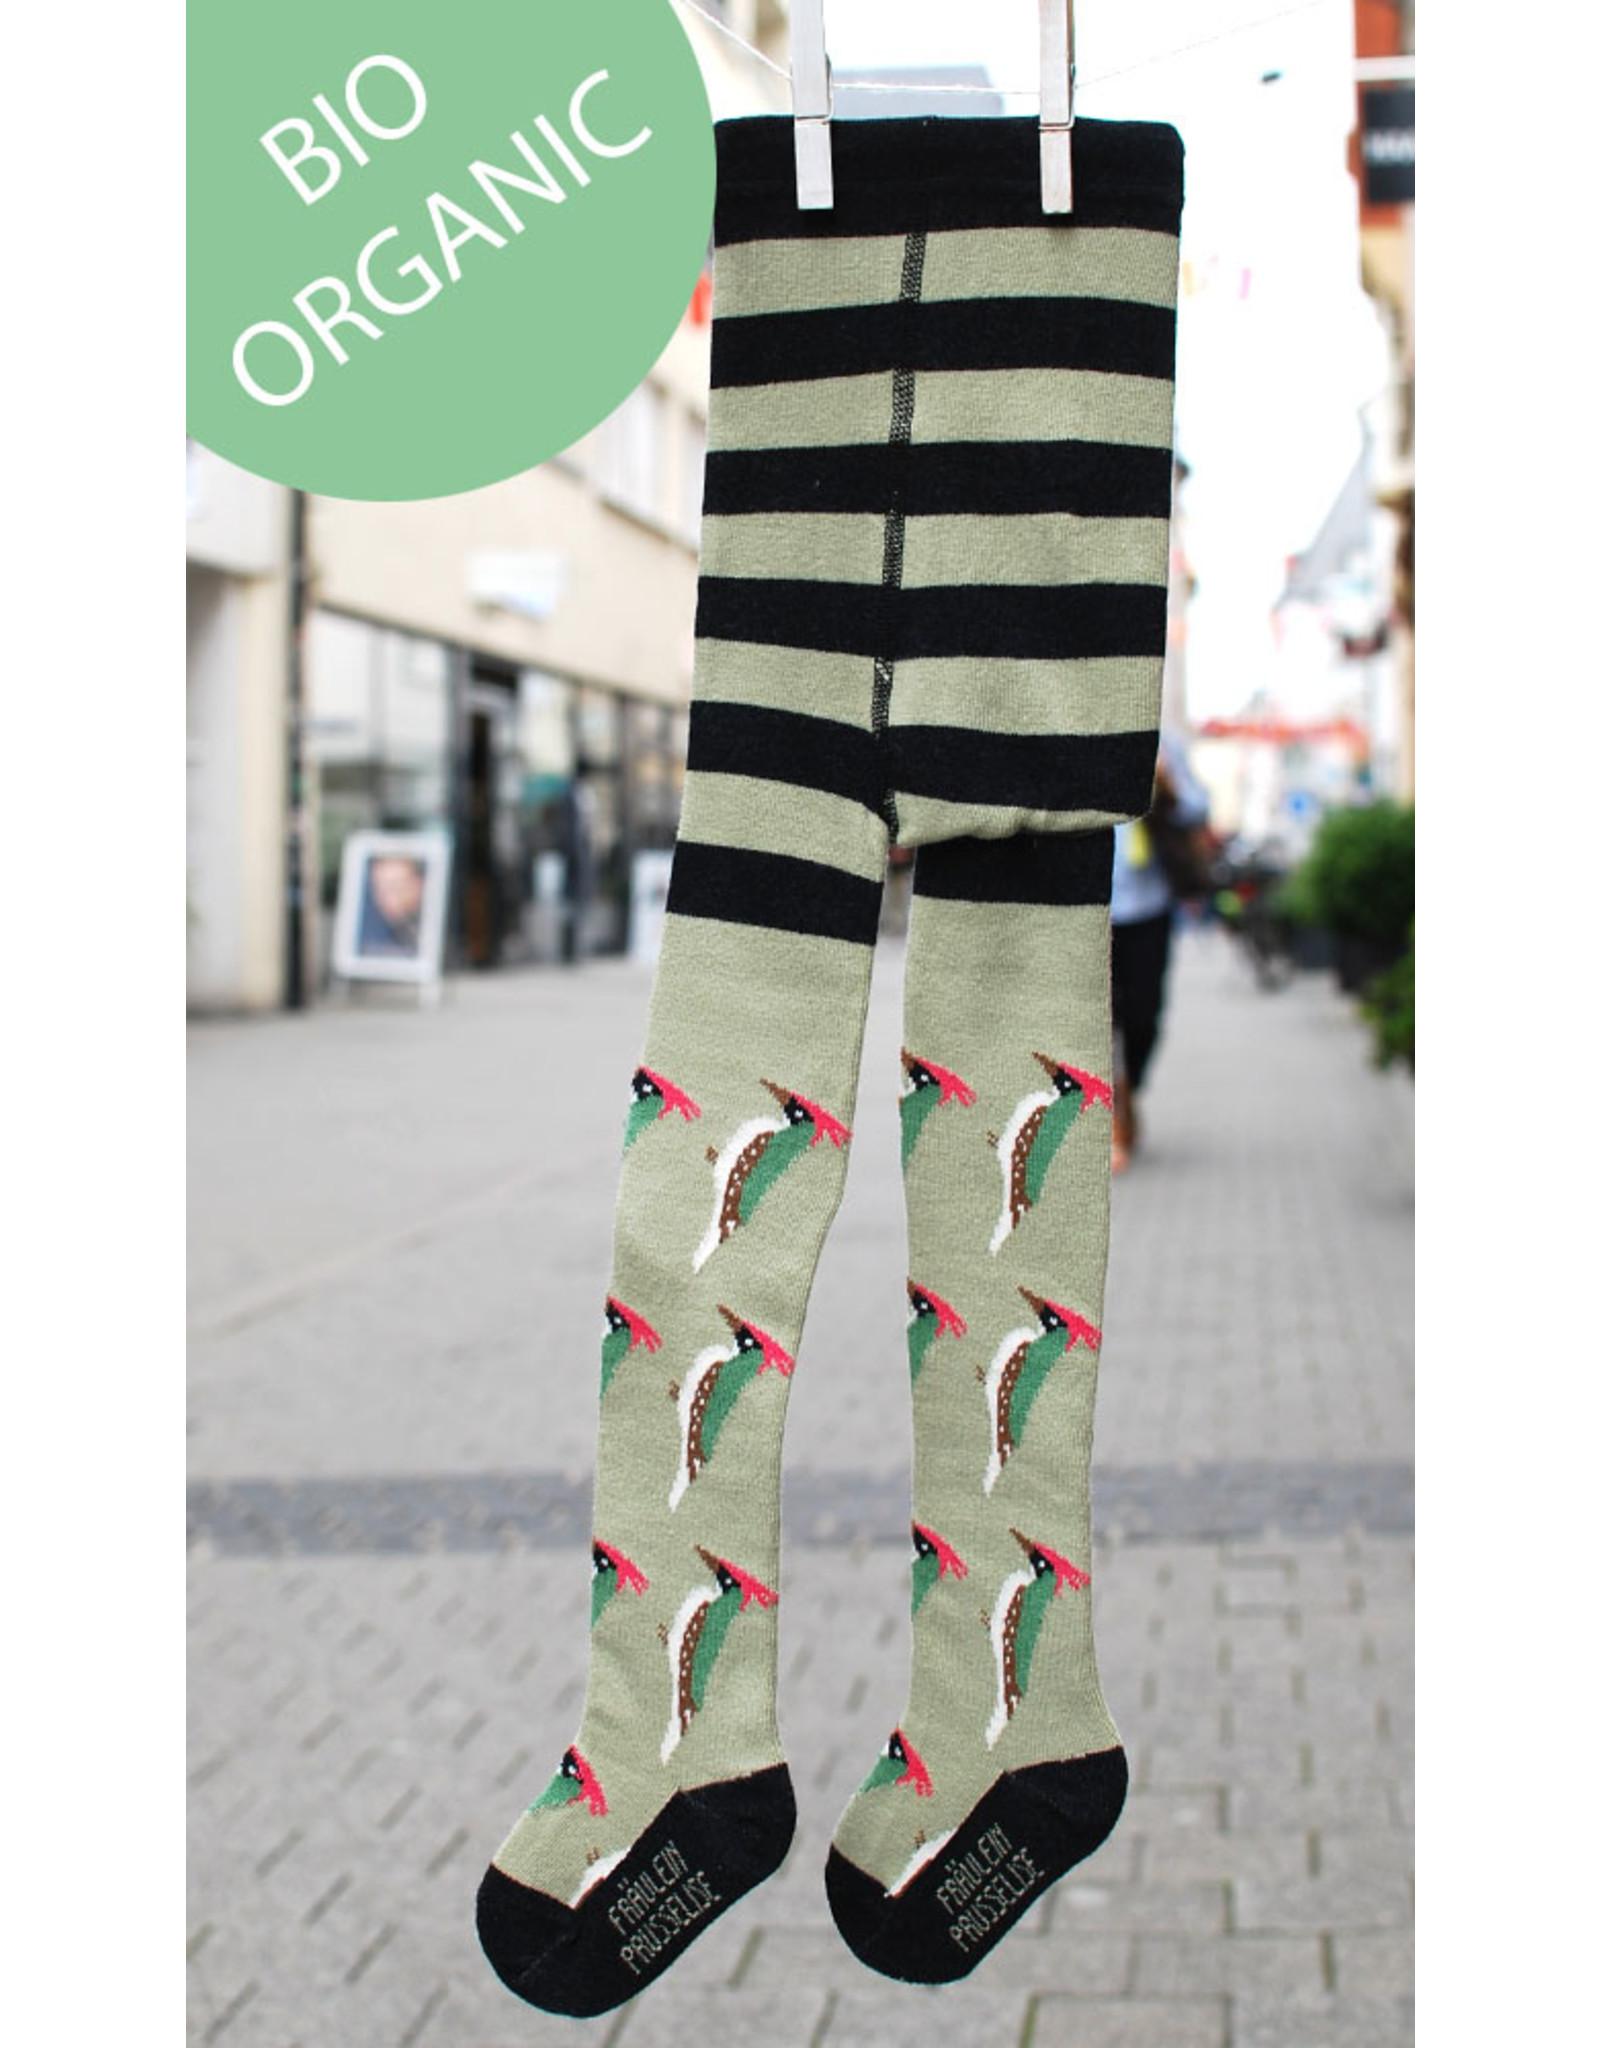 Fräulein Prusselise Children's maillots - woodpeckers